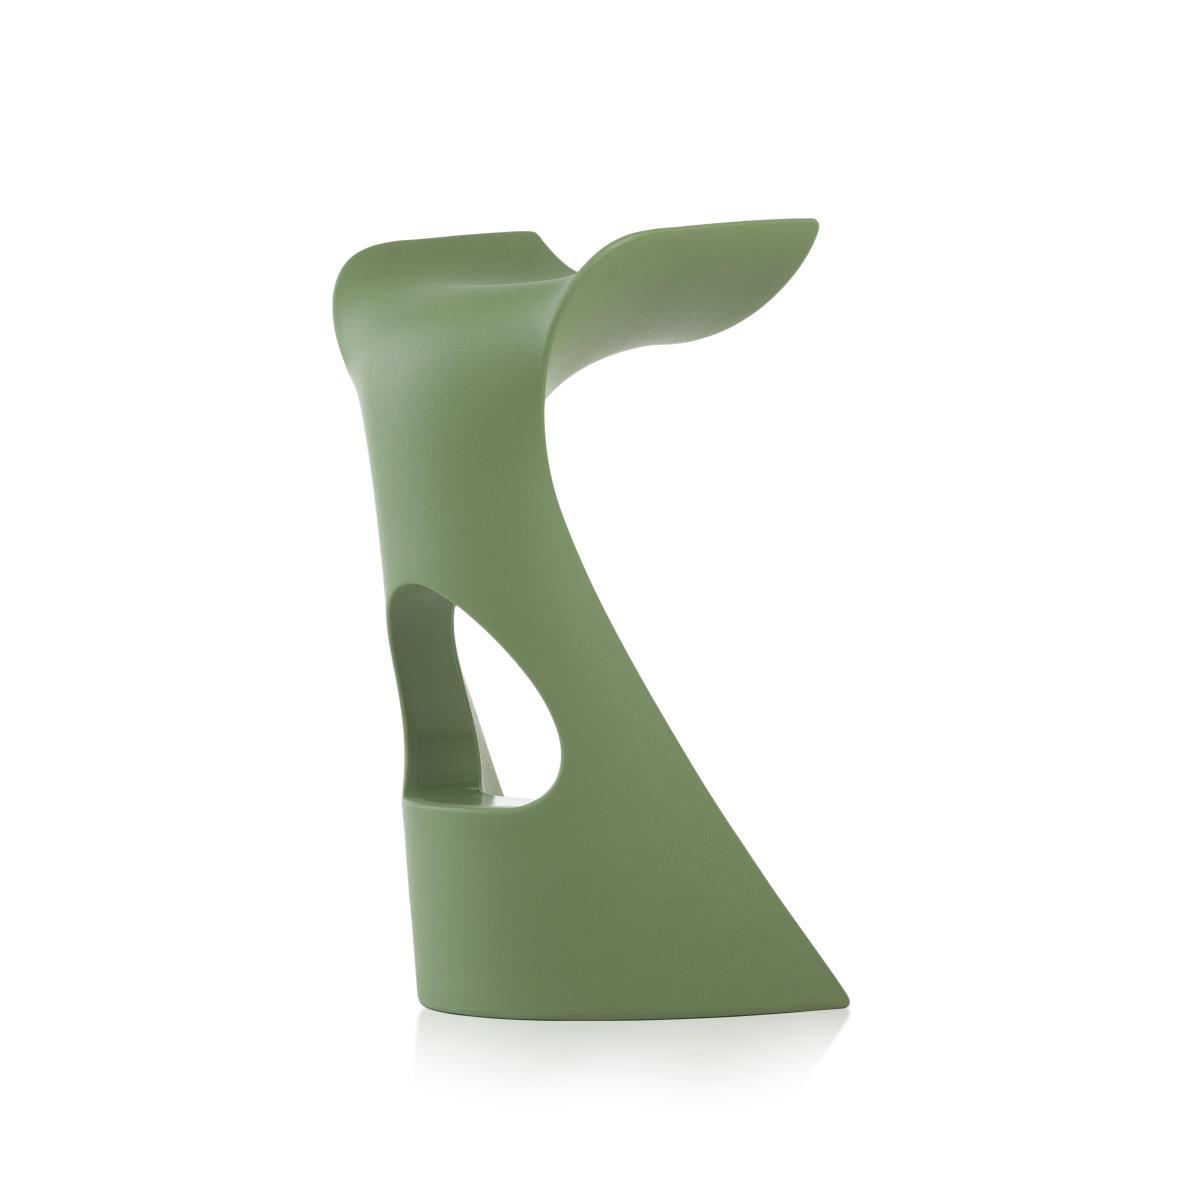 KONCORD Barhocker von Karim Rashid malva green